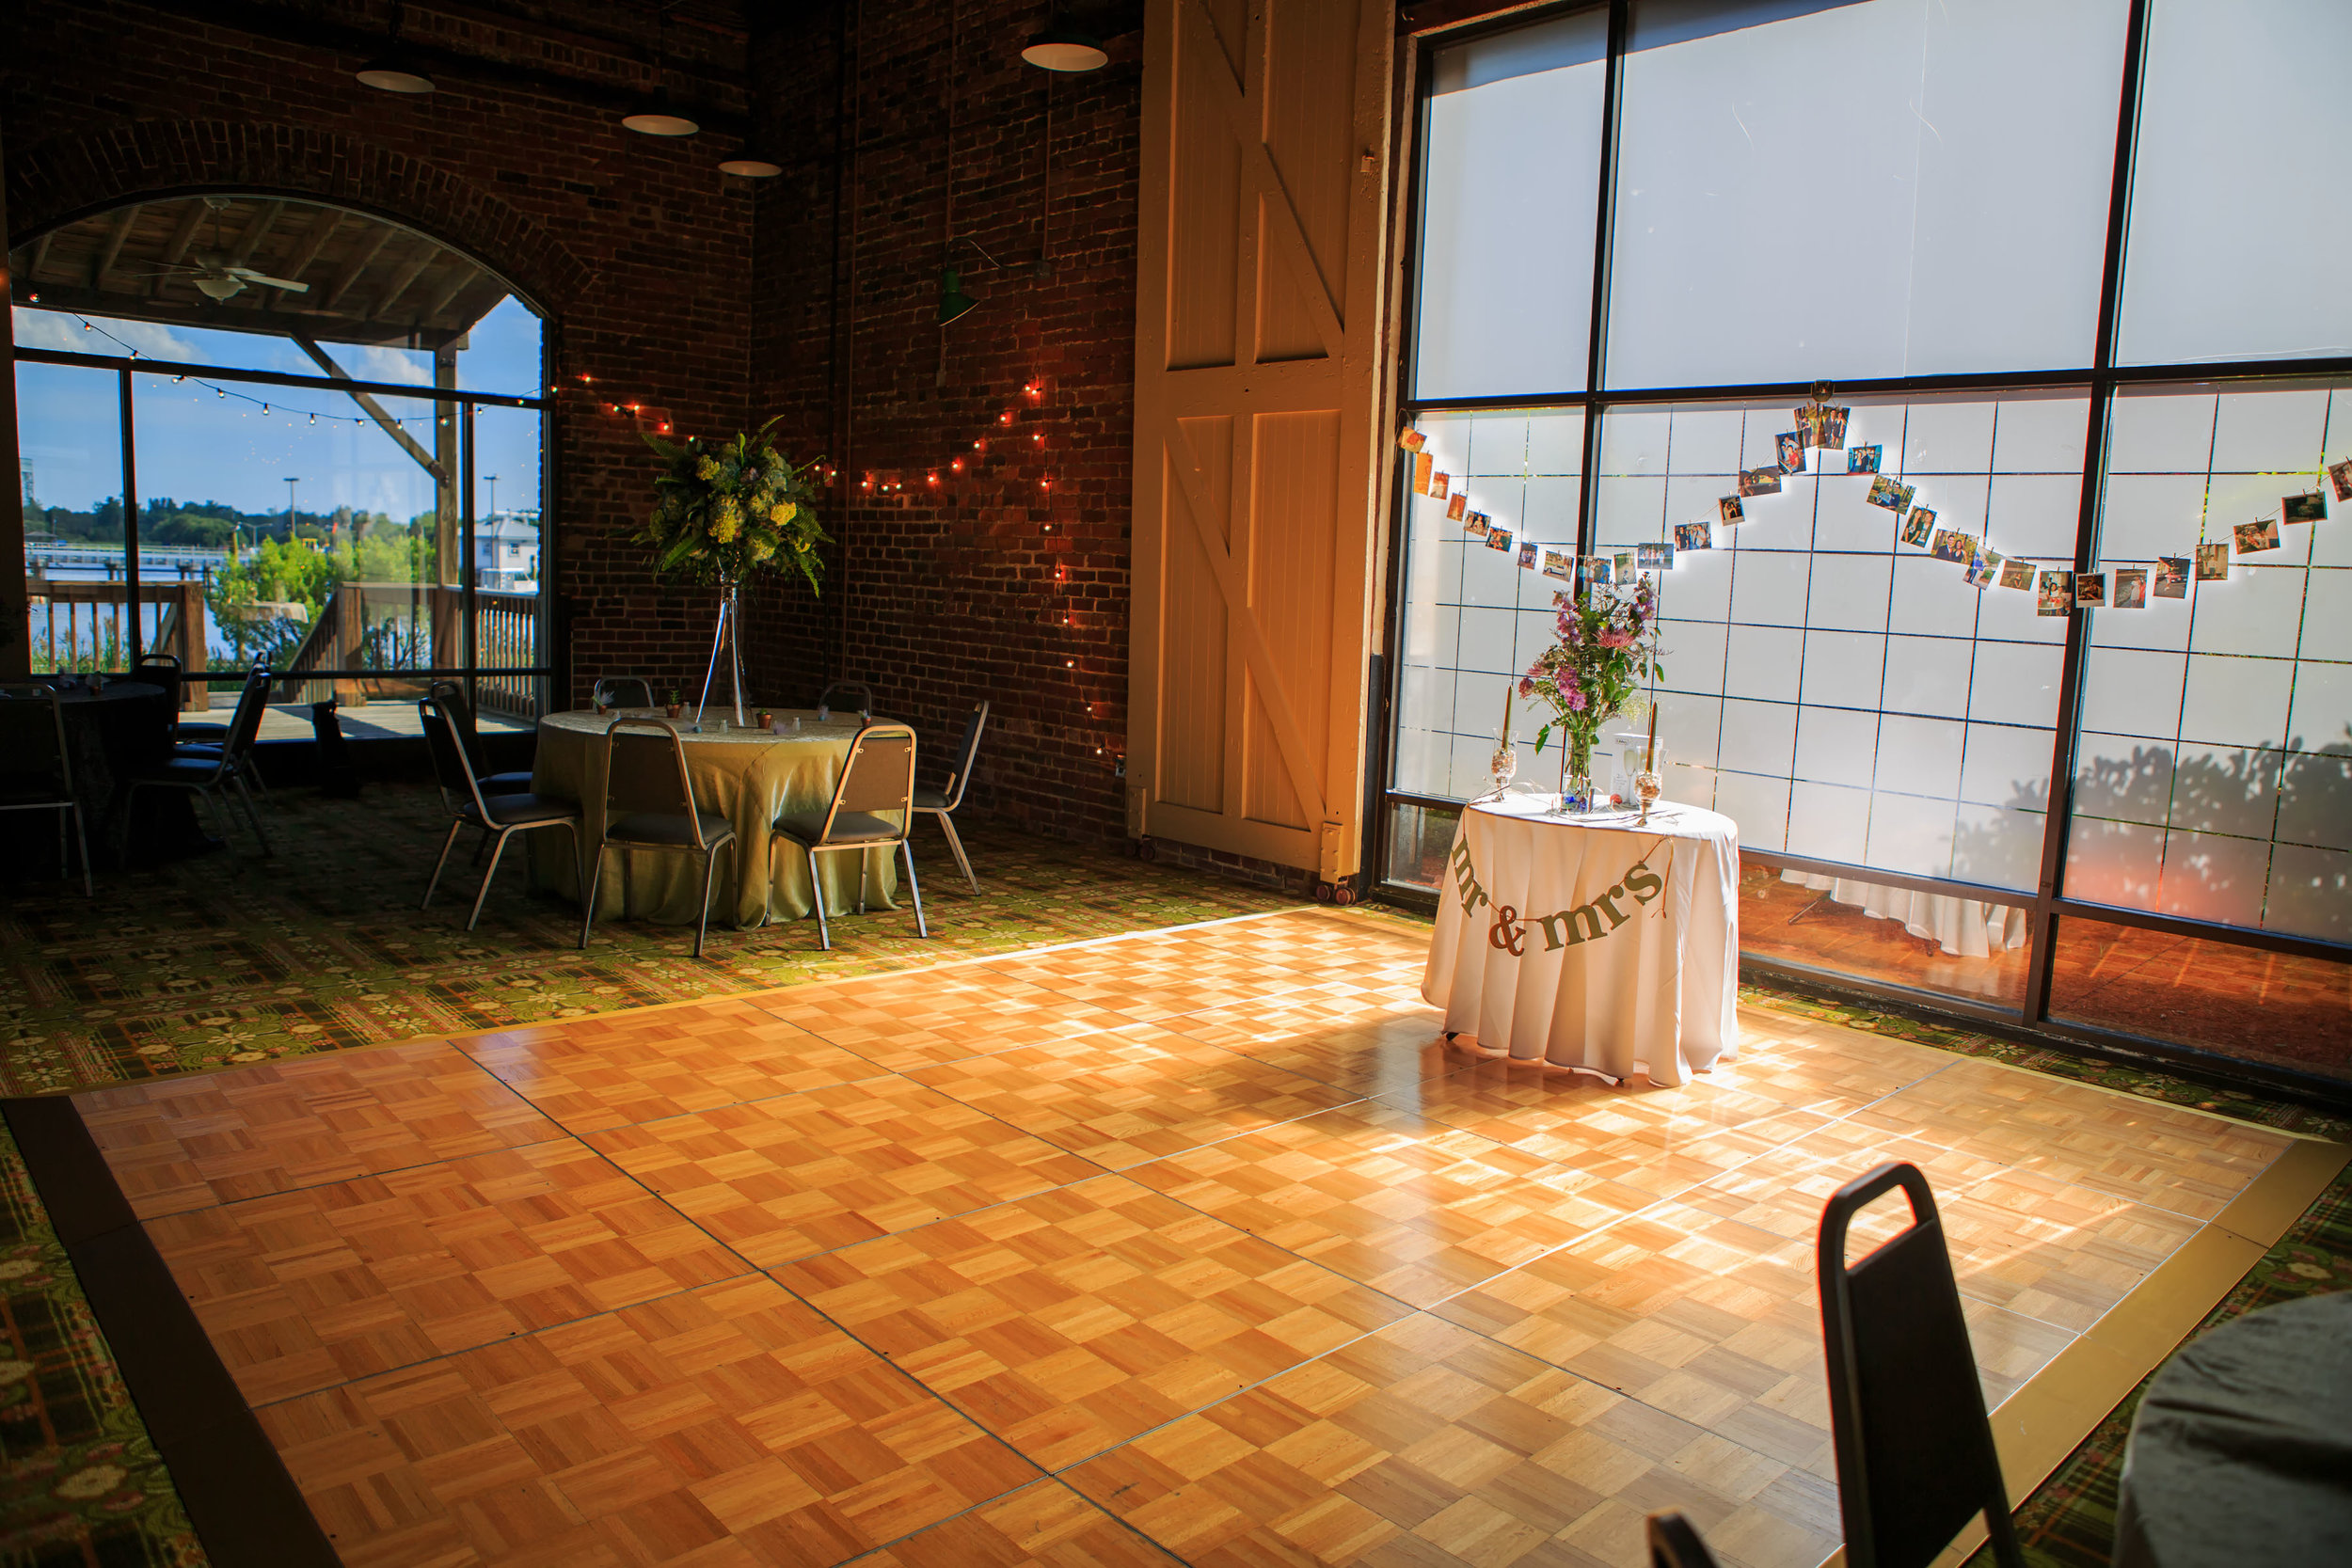 North_Carolina_Wedding_Photographer_Tiffany_Abruzzo_Reception_7.jpg